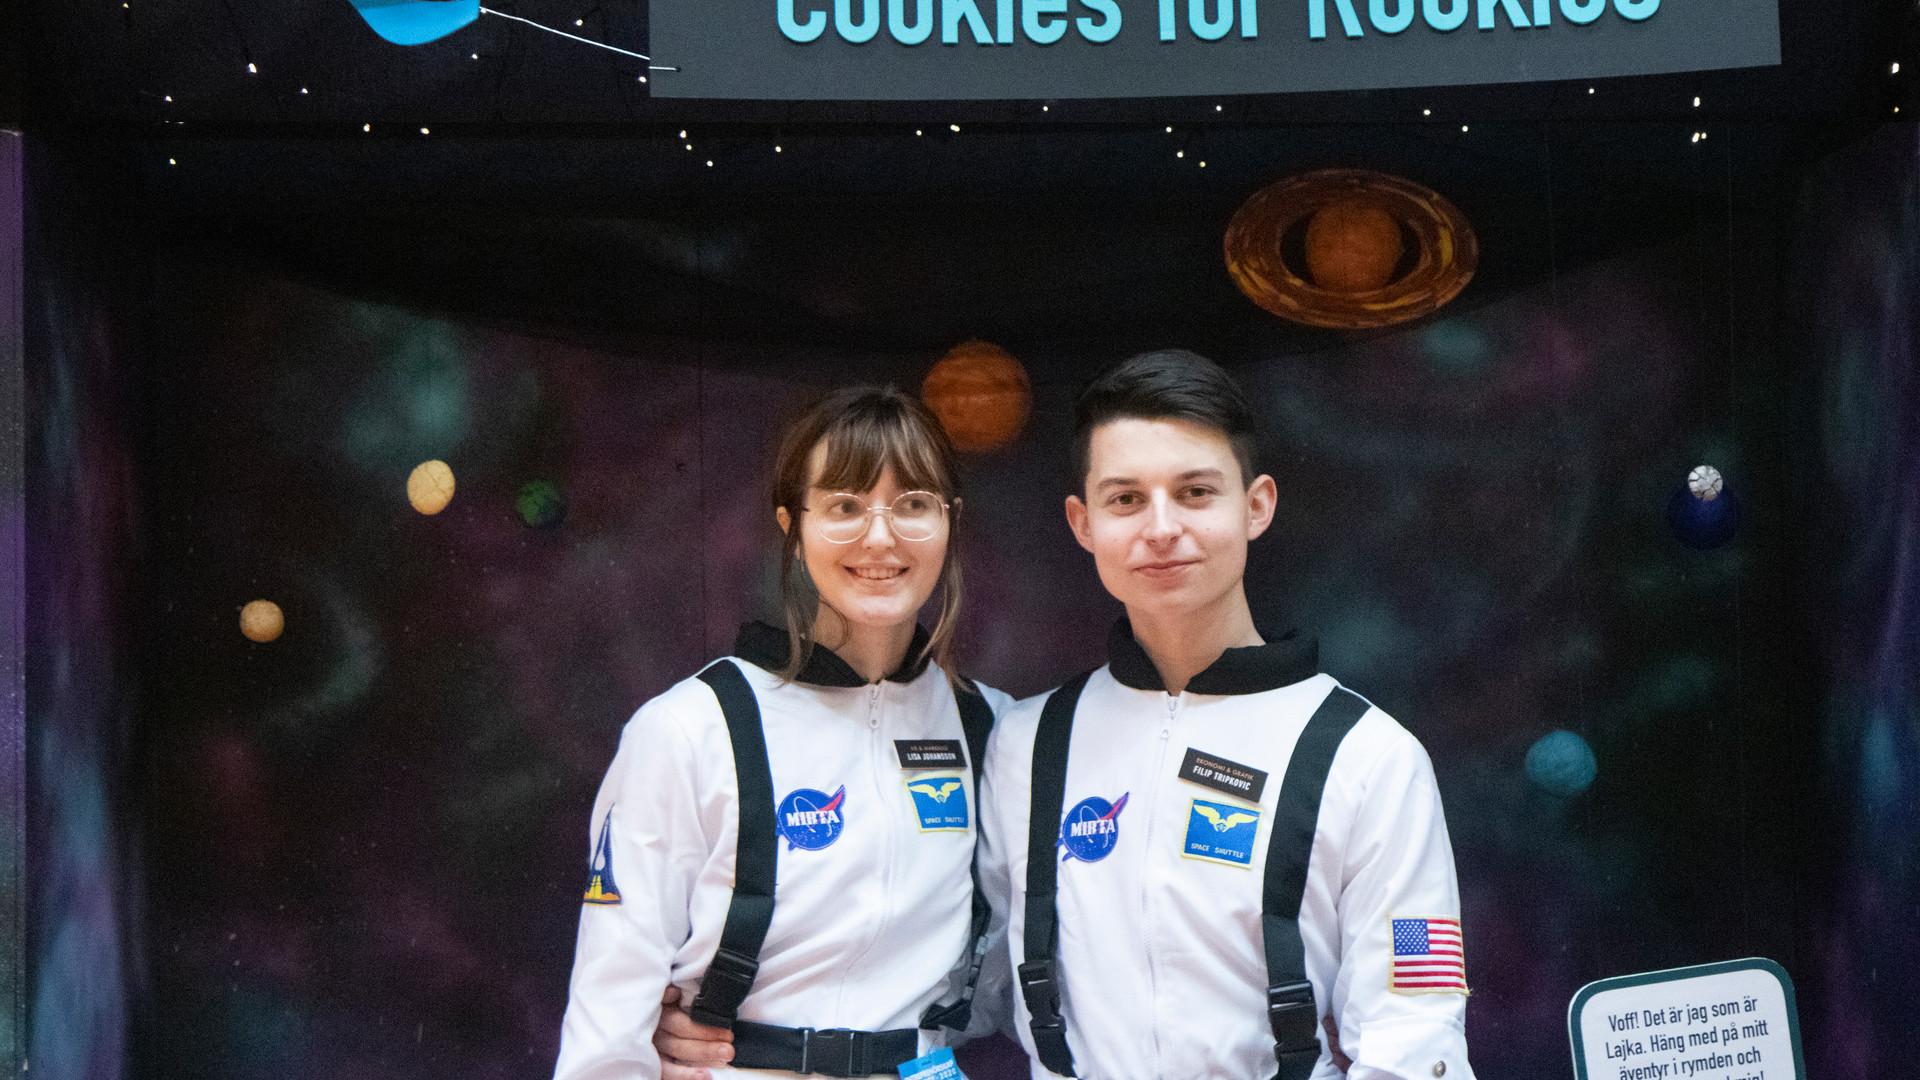 Cookies for Rookies UF 19/20